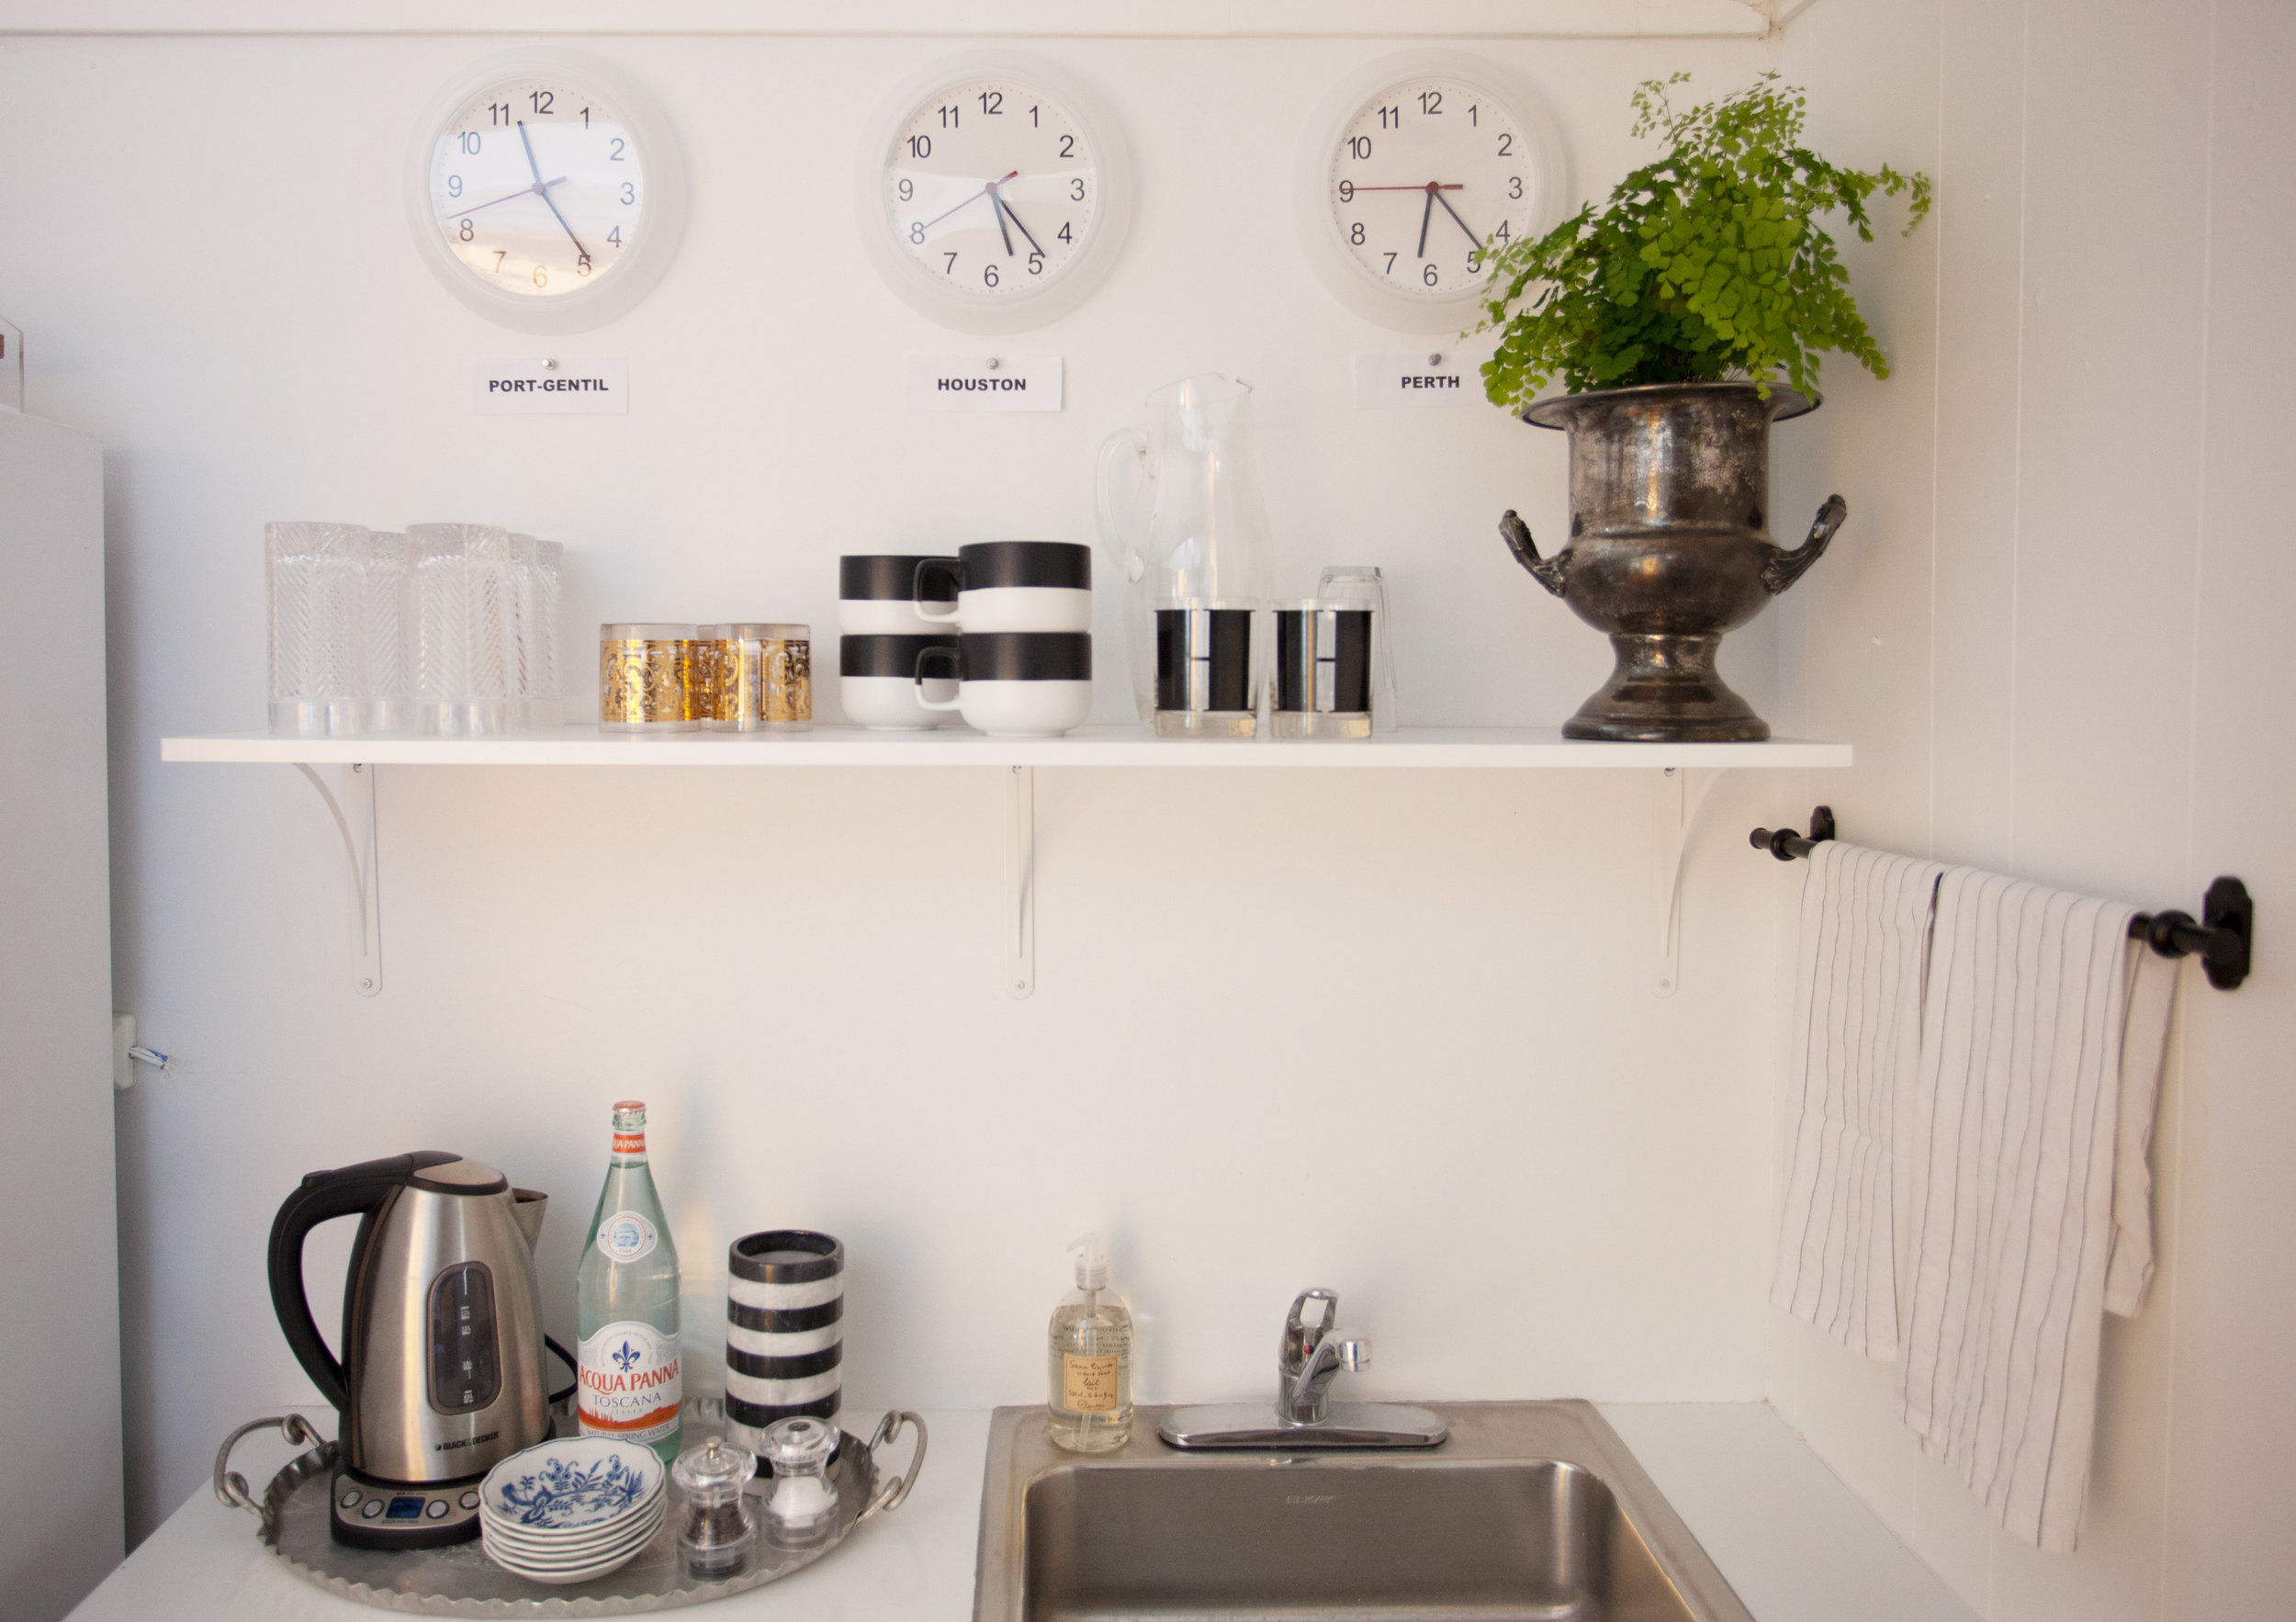 Kitchenette of Houston interior design office of Jamie House Design